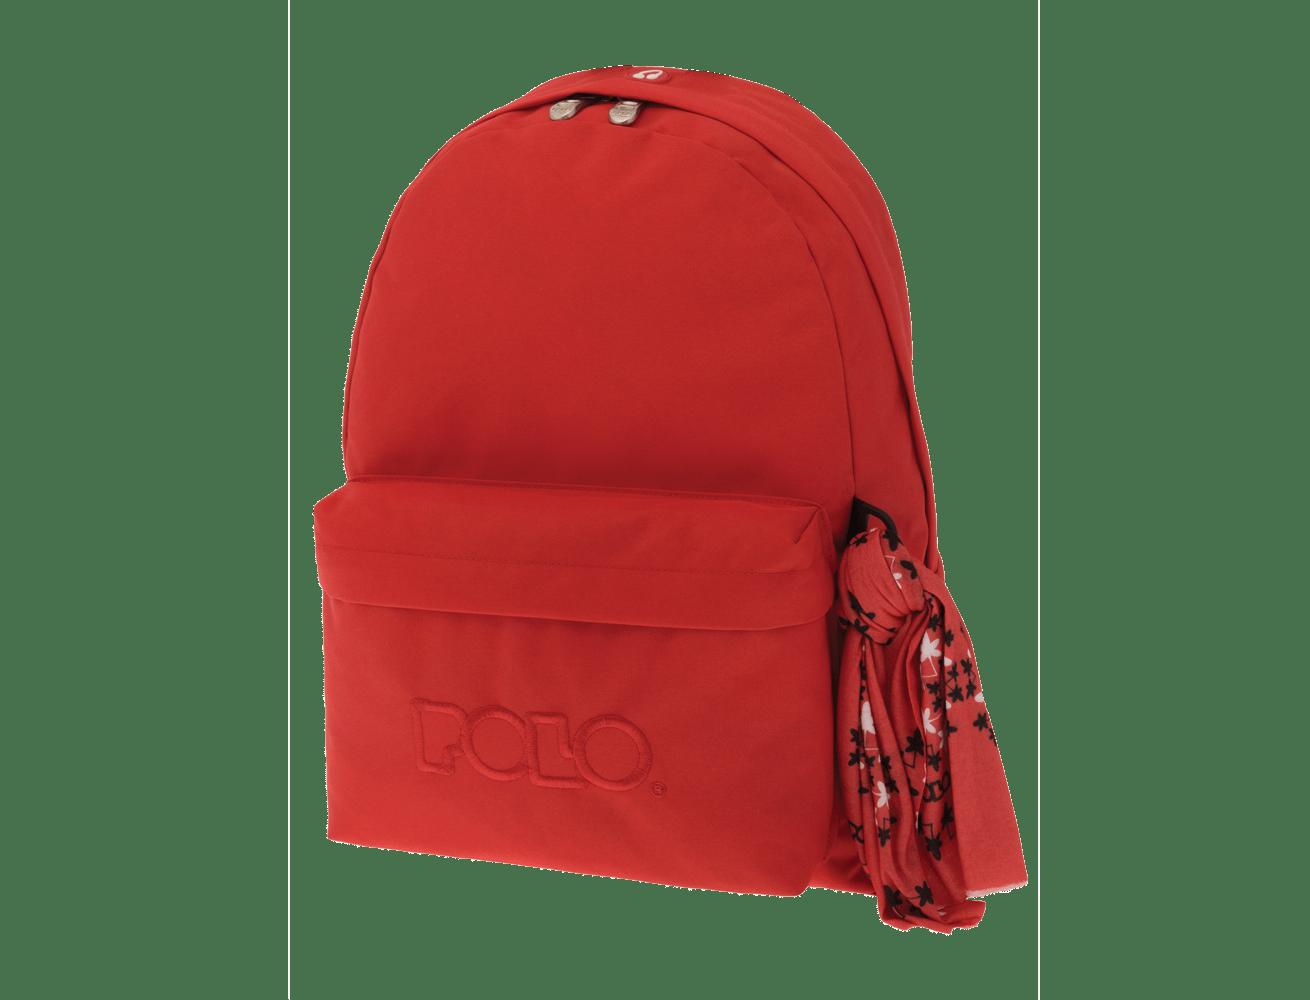 f19c969d908 Σακίδιο Πλάτης Polo Original Backpack - 9-01-135-14 - Lexicon Shop